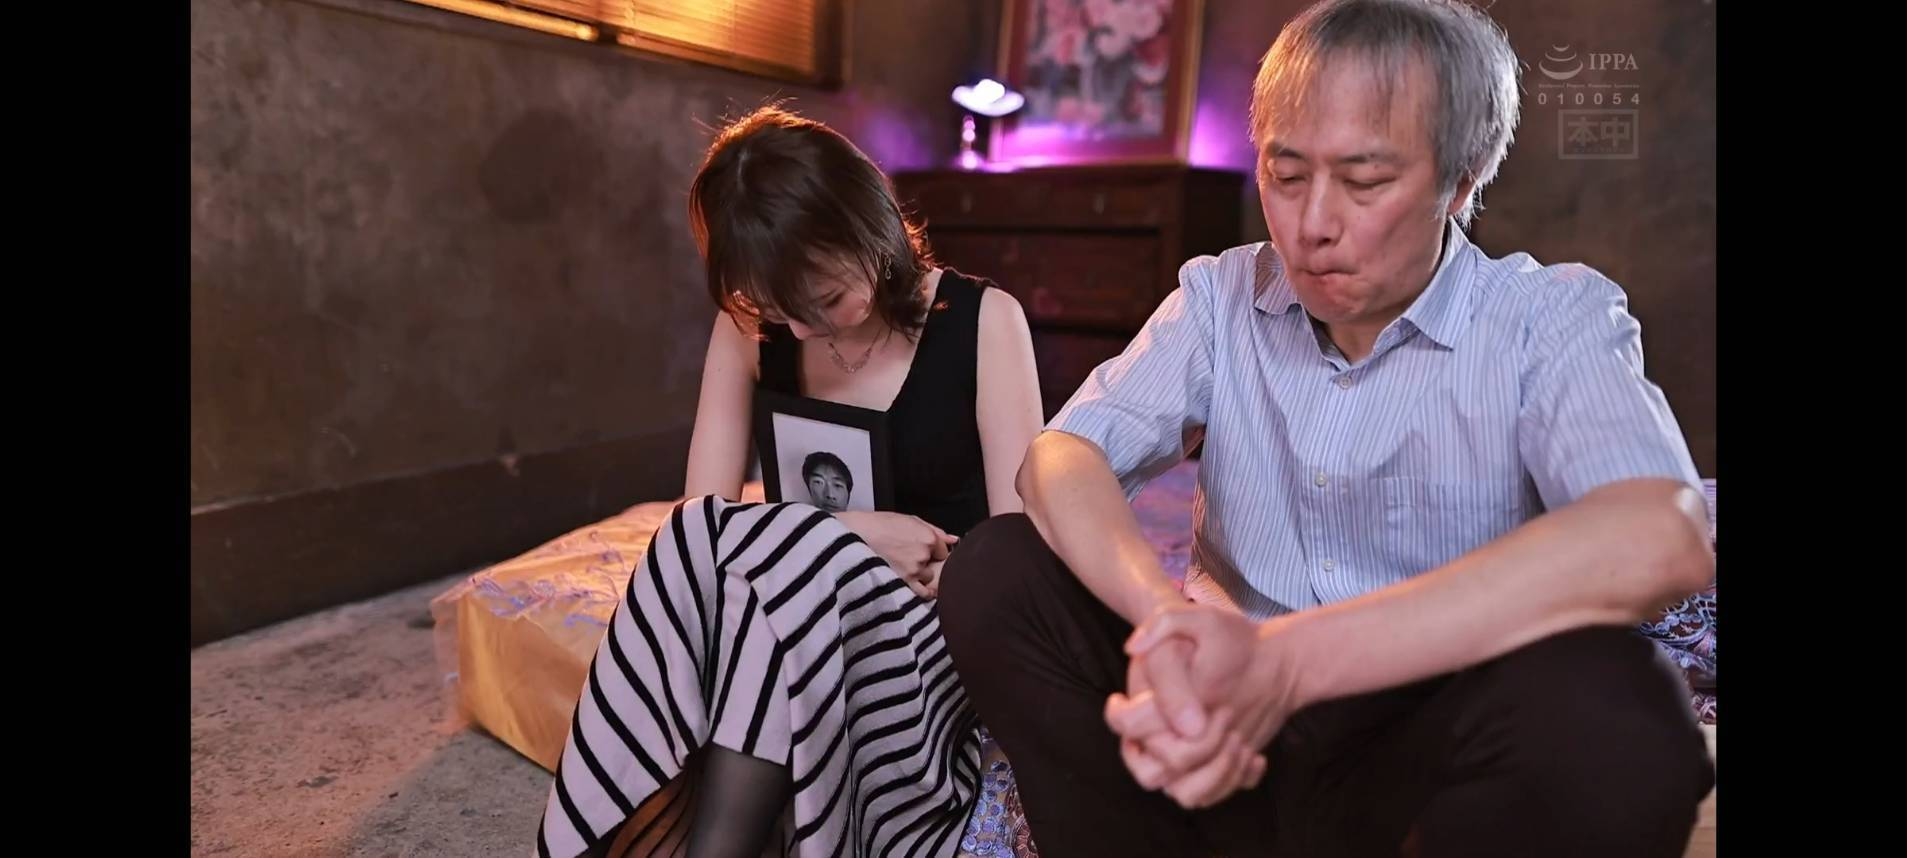 HND-992风格诡异広瀬りおな(广濑里绪菜)表现惊悚 (3)